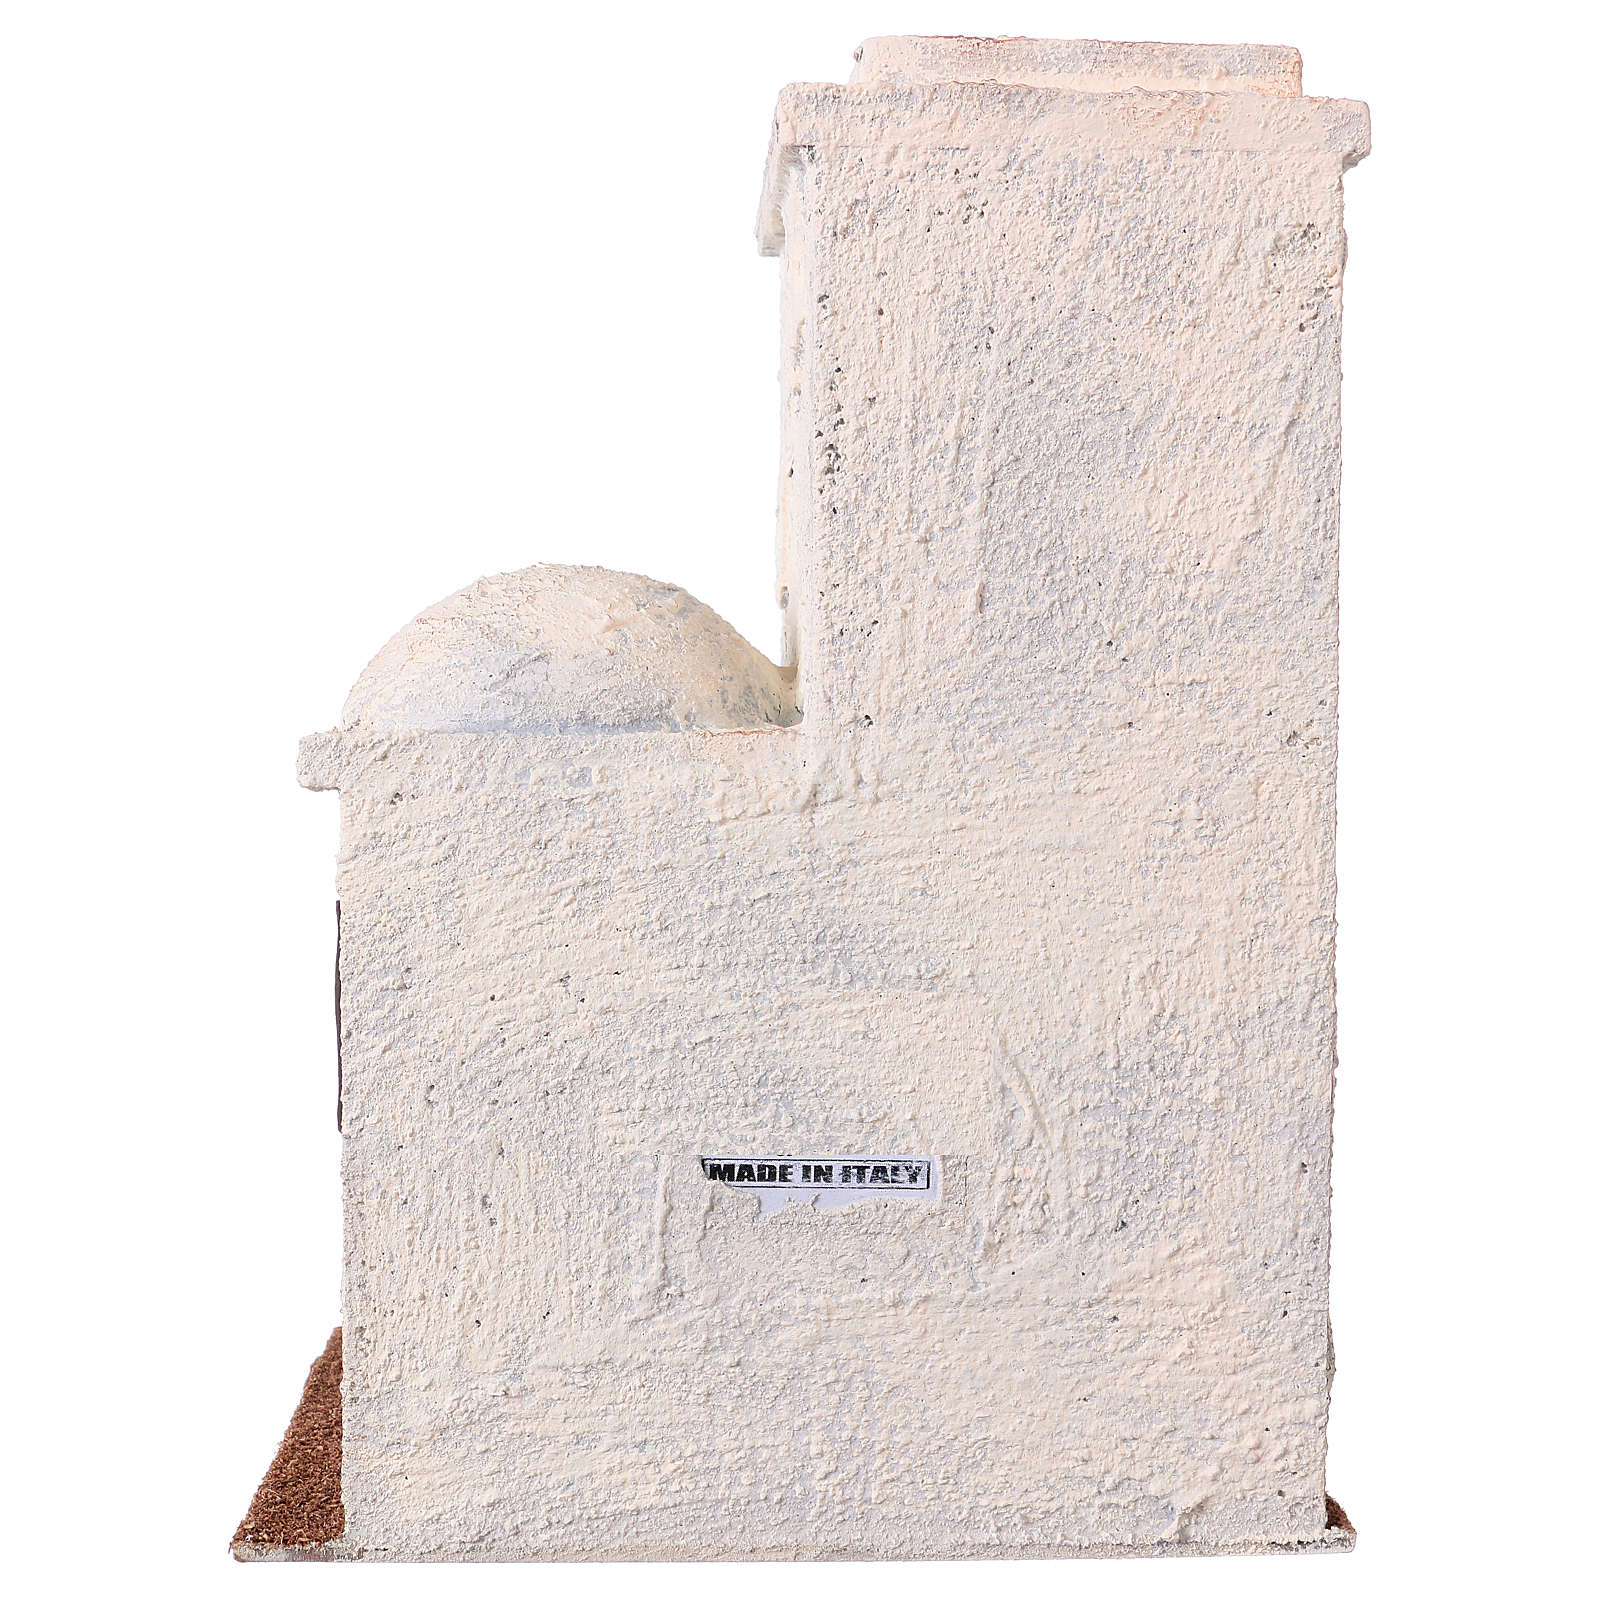 House Palestinian style 25x20x15 cm, for 9 cm nativity 4